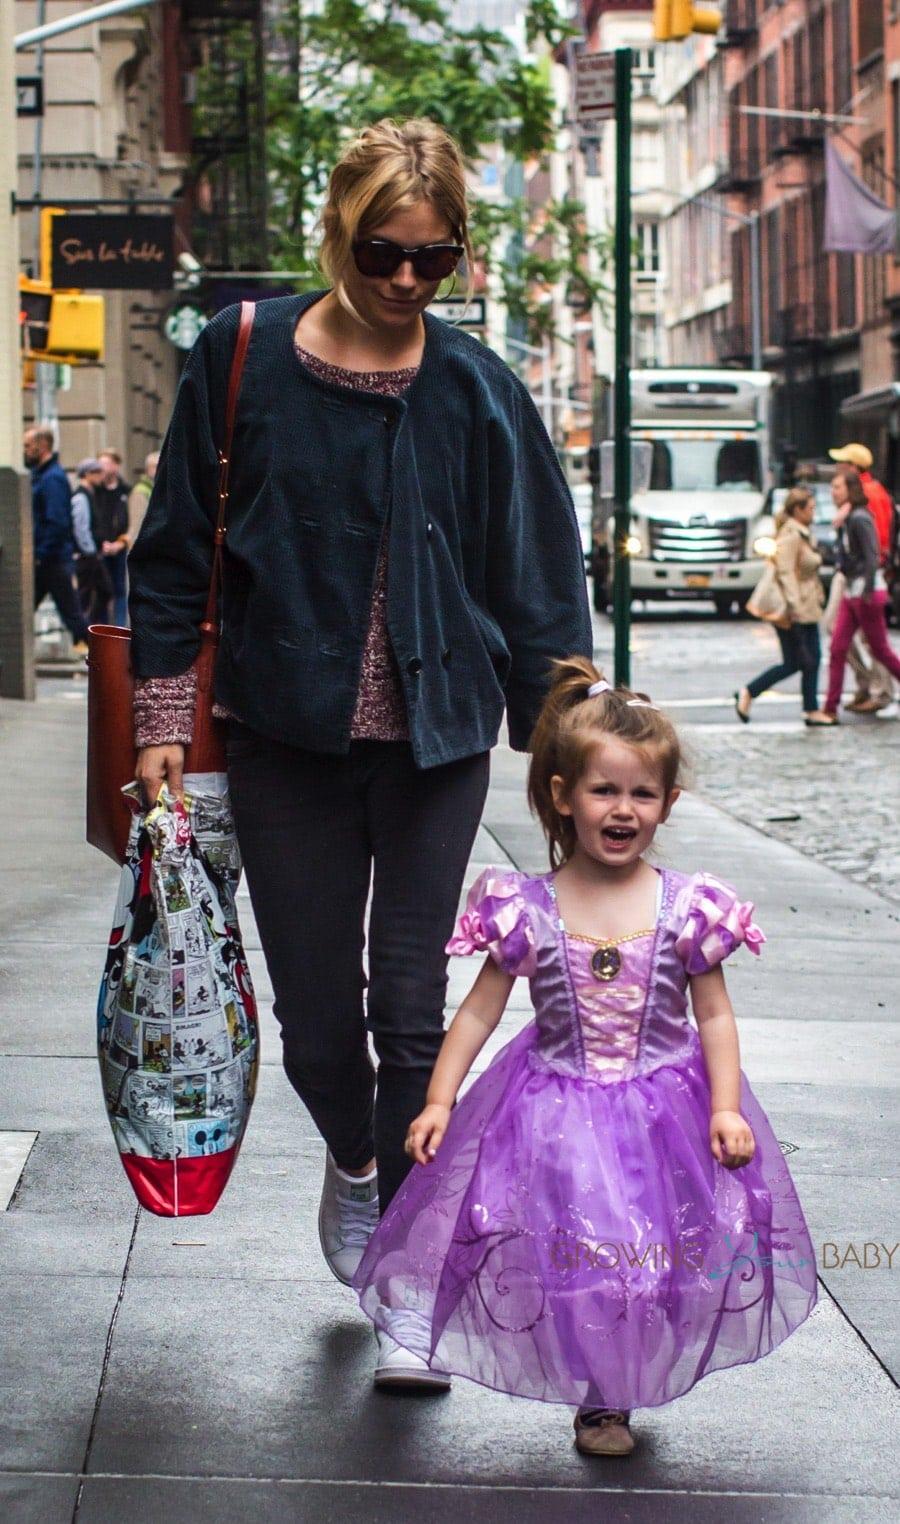 sienna miller with daughter marlowe sturridge dressed as a princess in